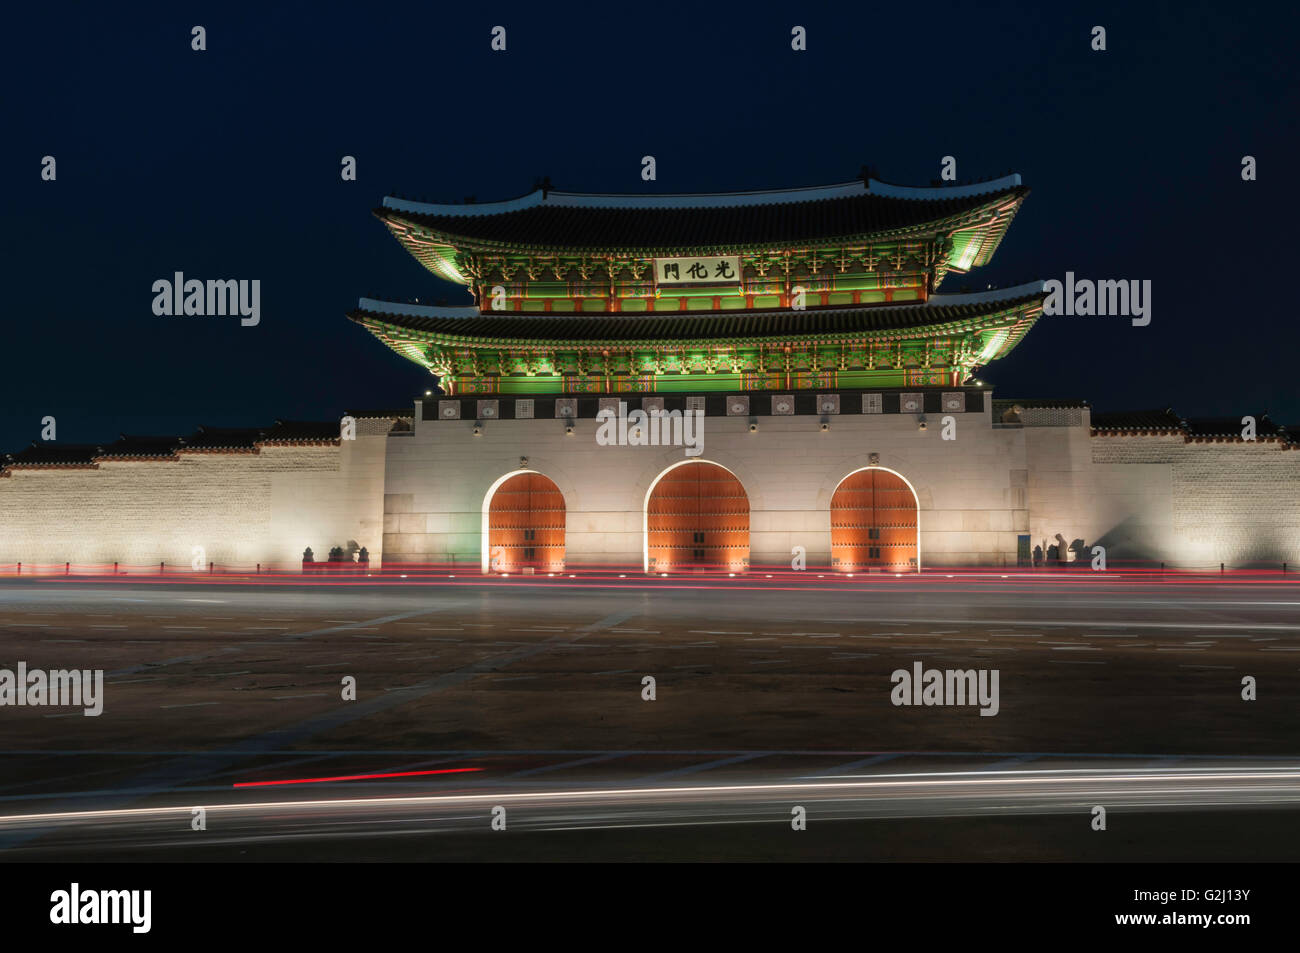 Gwanghwamun, main gate, with motion blur traffic at night, Gyeongbokgung Palace, Jongno-gu, Seoul, South Korea Stock Photo